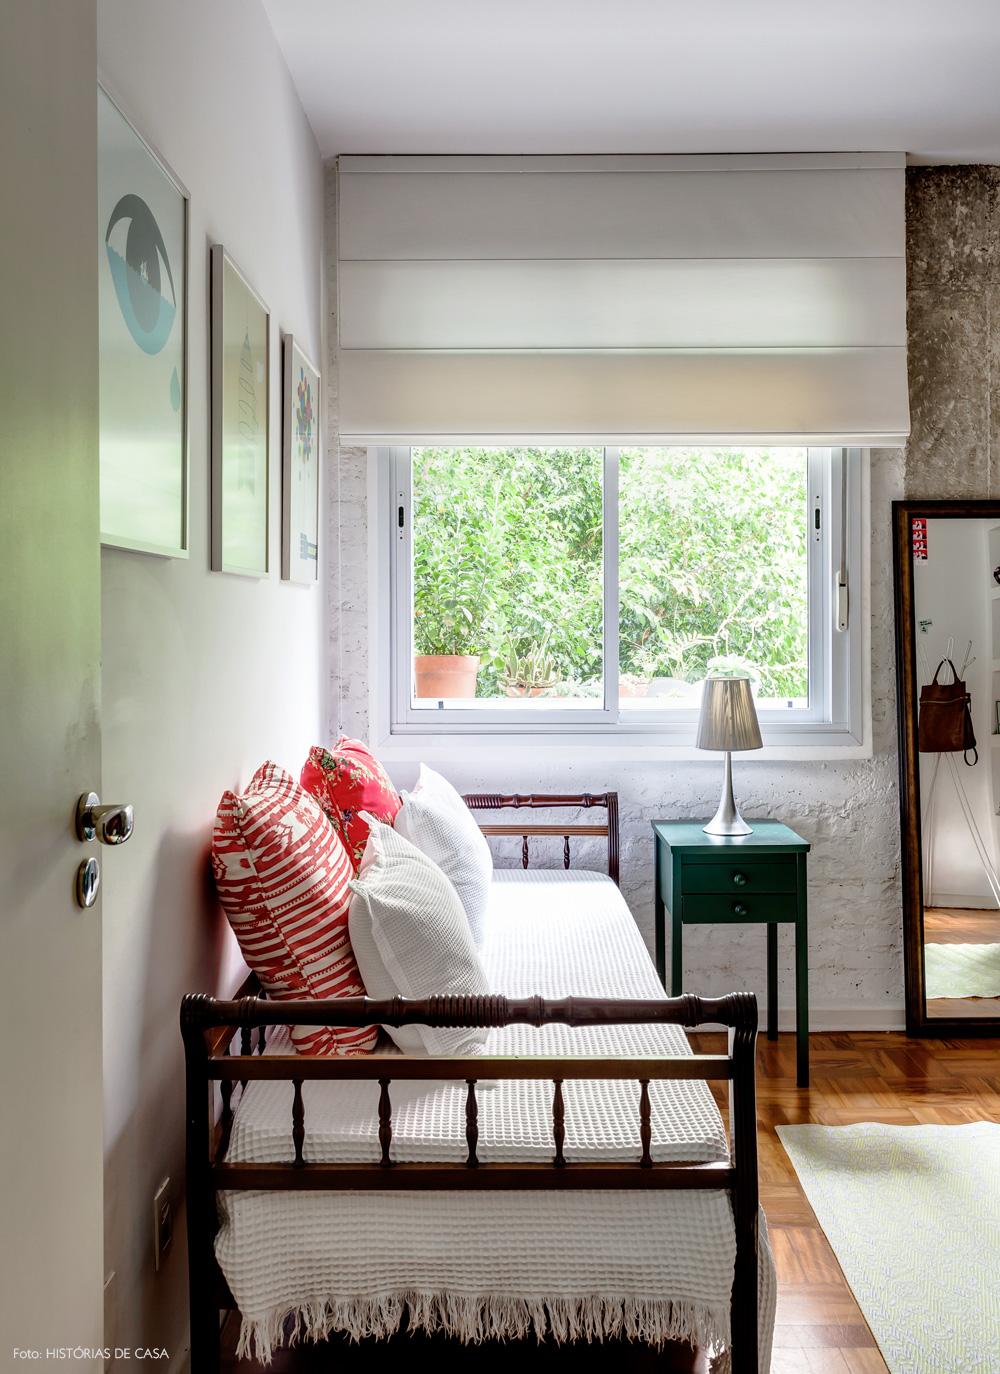 27-decoracao-quarto-branco-cama-antiga-parede-rustica